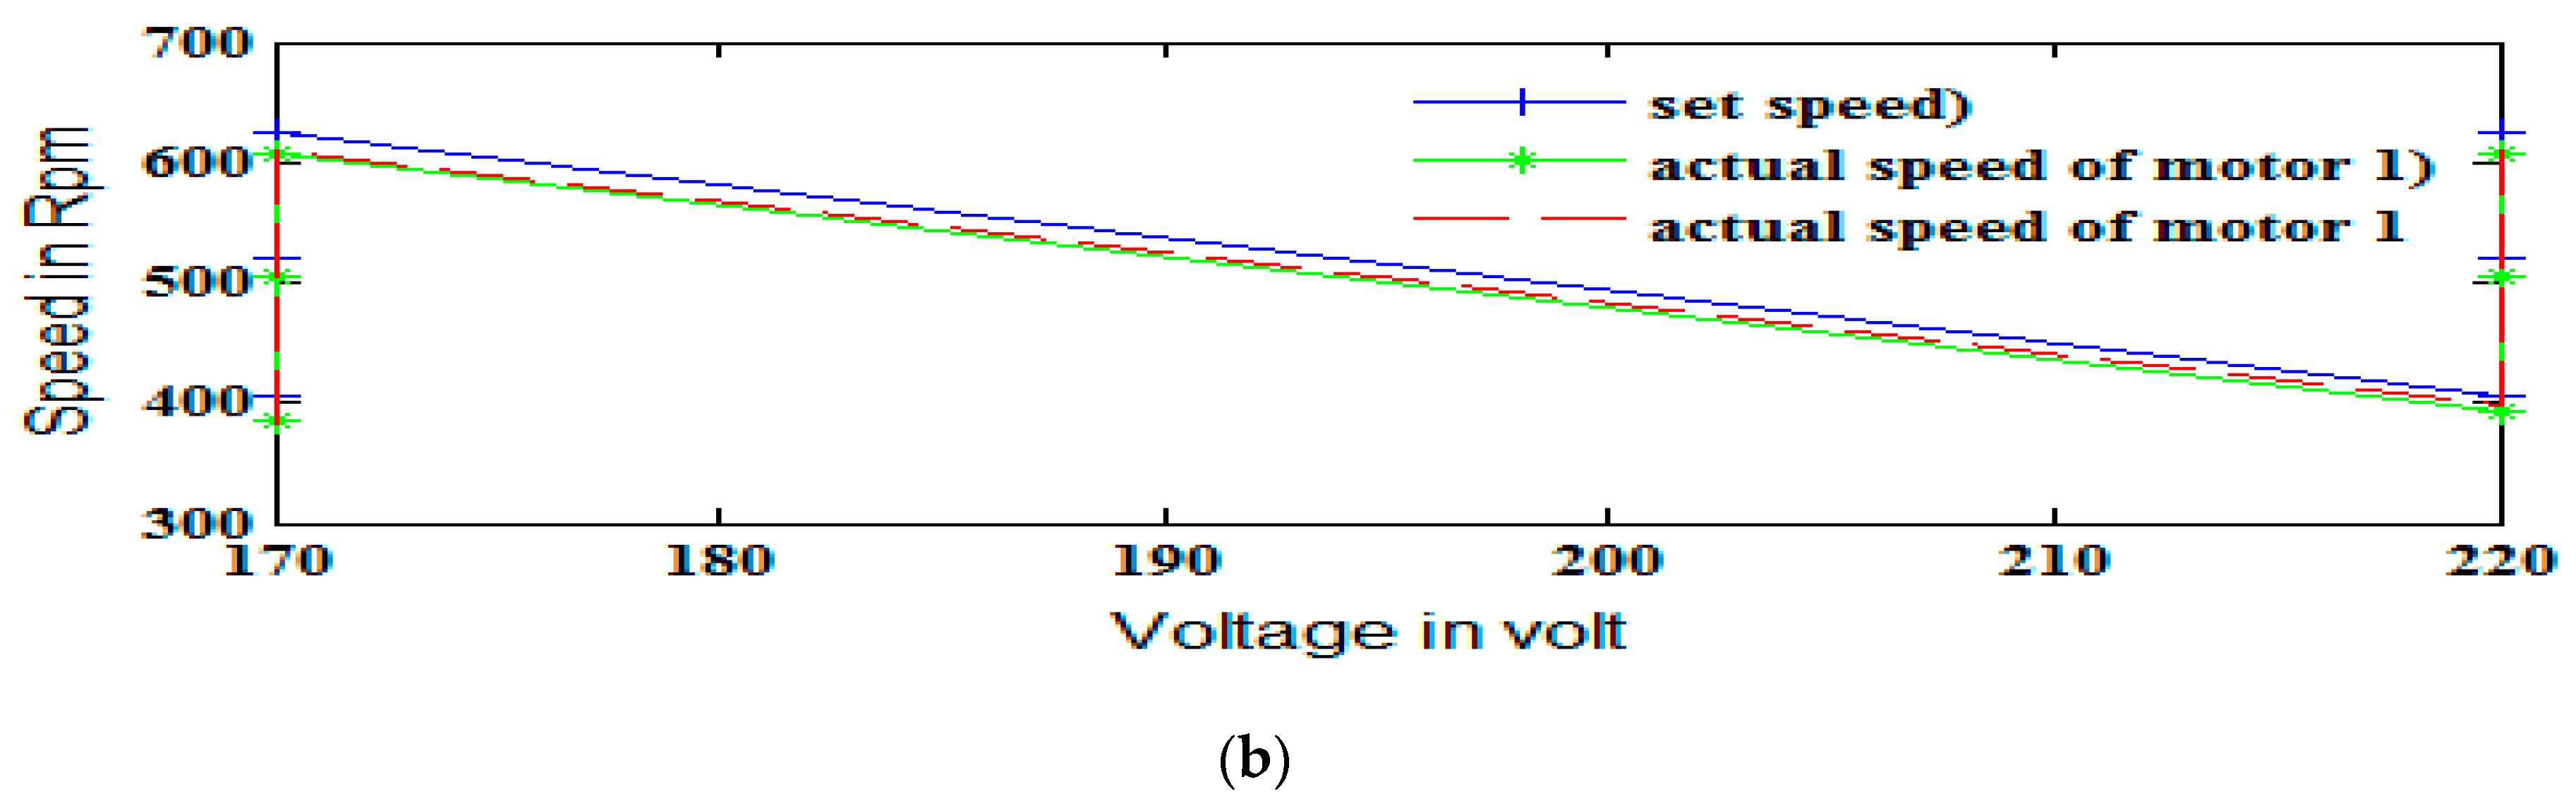 Energies | Free Full-Text | Neural Network-Based Model